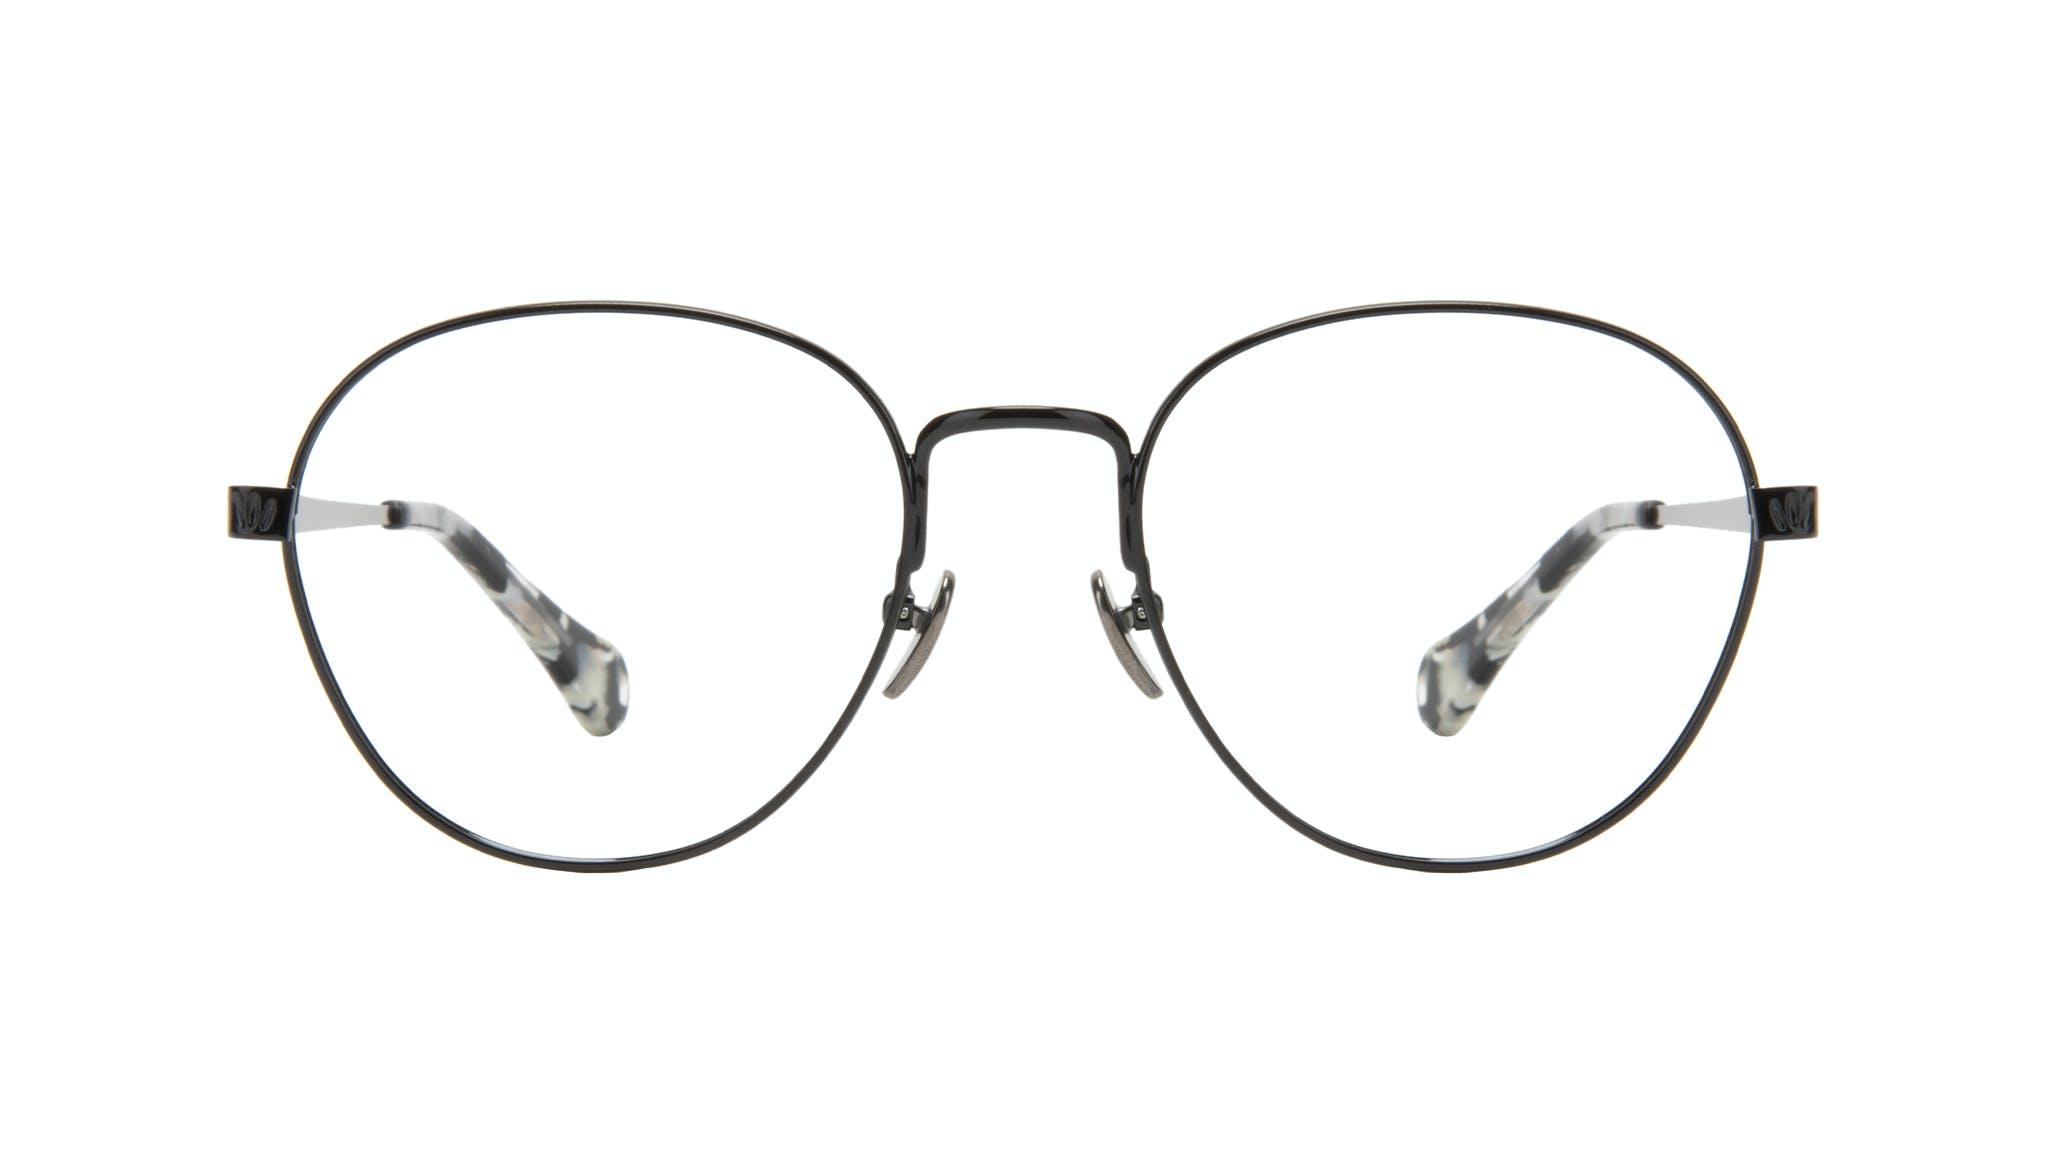 Affordable Fashion Glasses Round Eyeglasses Women Brace Onyx Marble Front